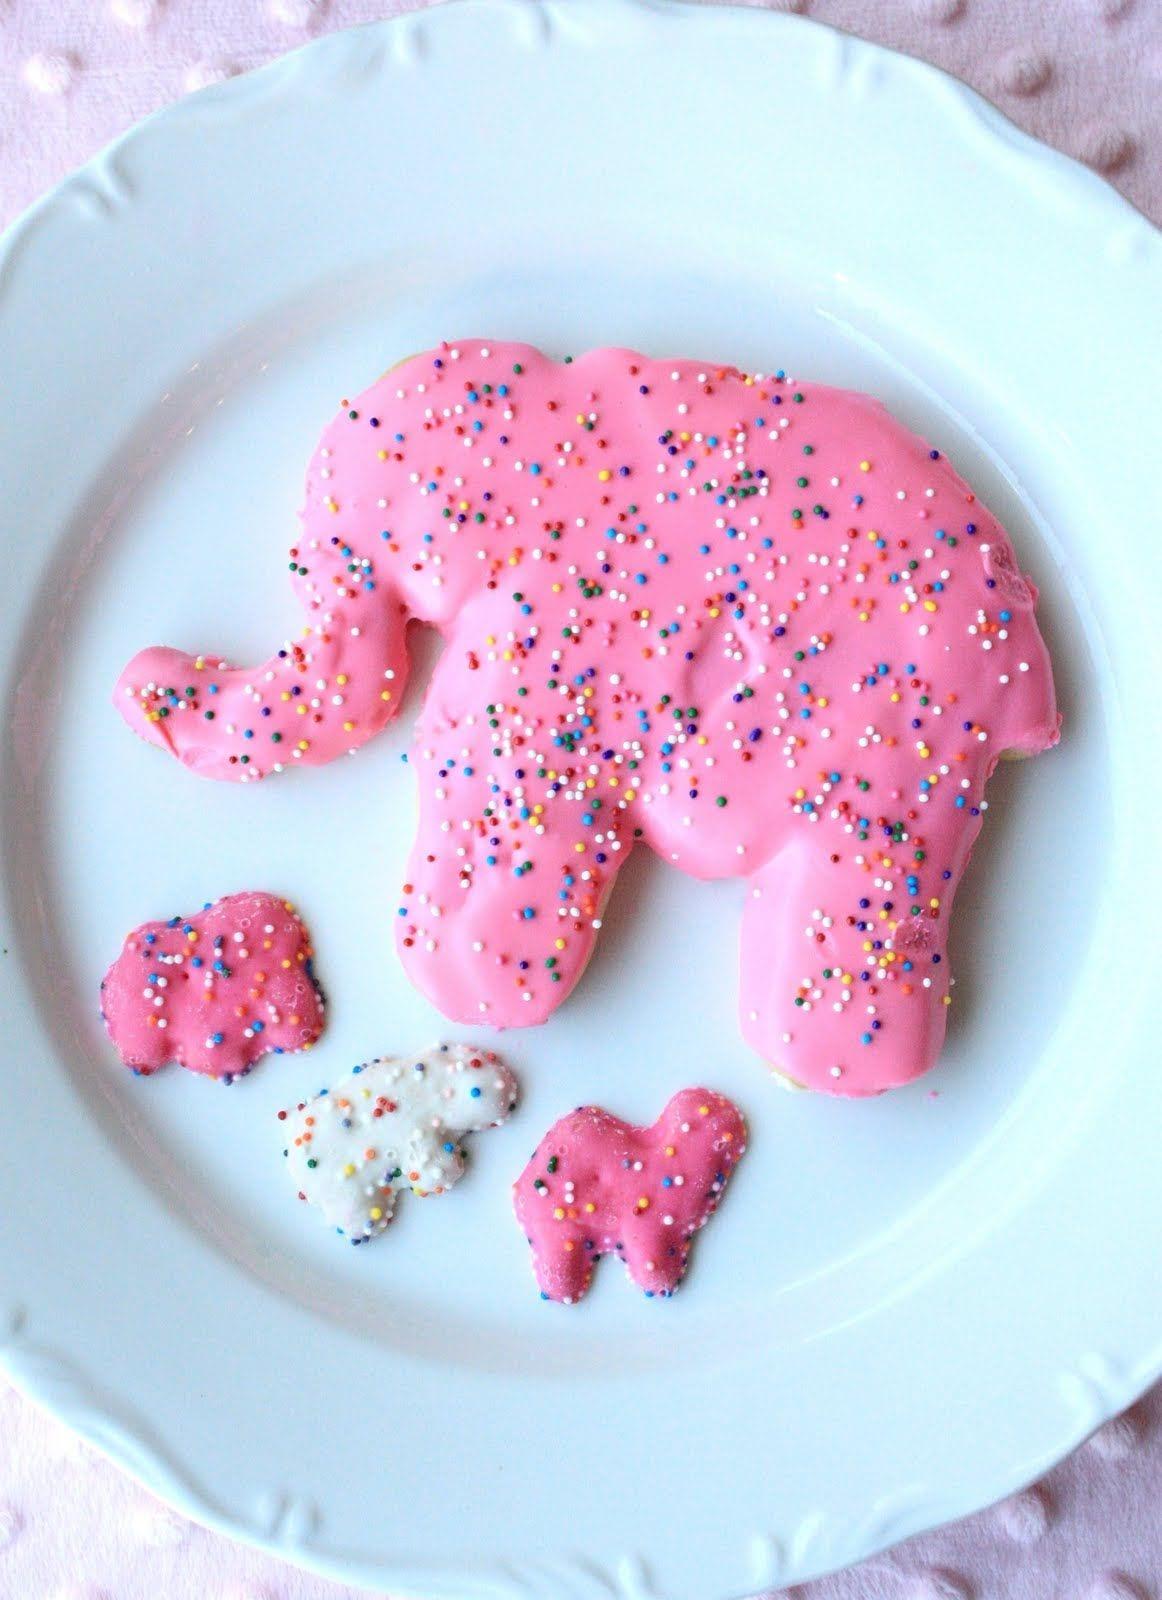 Mother's Original Circus Animal Cookies With My Jumbo Version) A